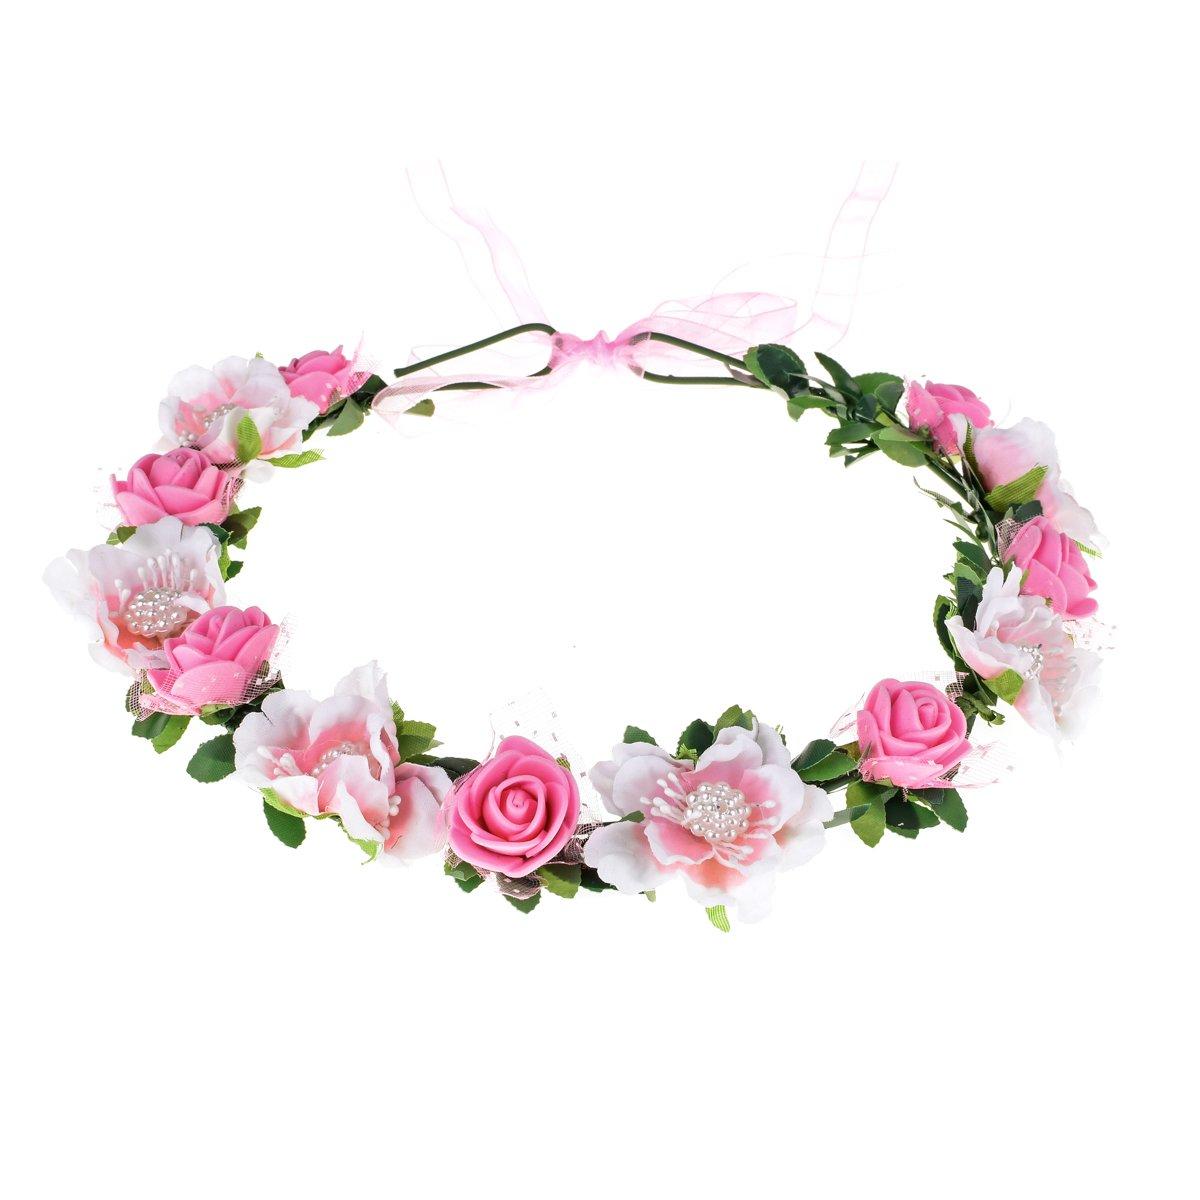 Best Flower Crowns For Weddings Amazon